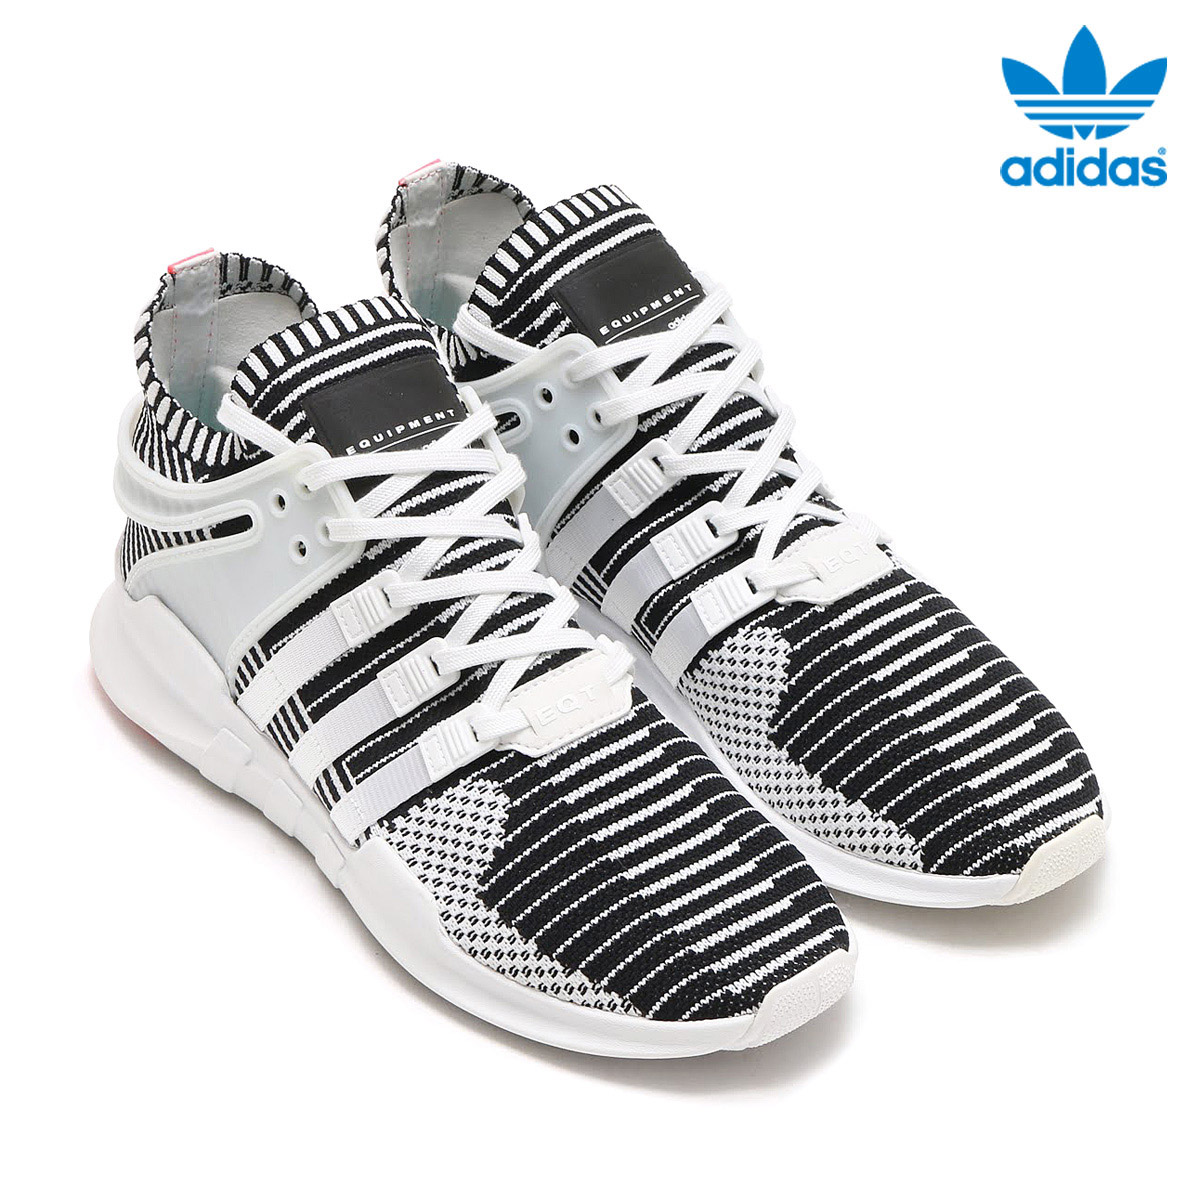 size 40 ba11c 39060 adidas Originals EQT SUPPORT ADV PK (Adidas original Sue ticket men Tosa  port) (Running White/Running White/Turbo) 17SS-I